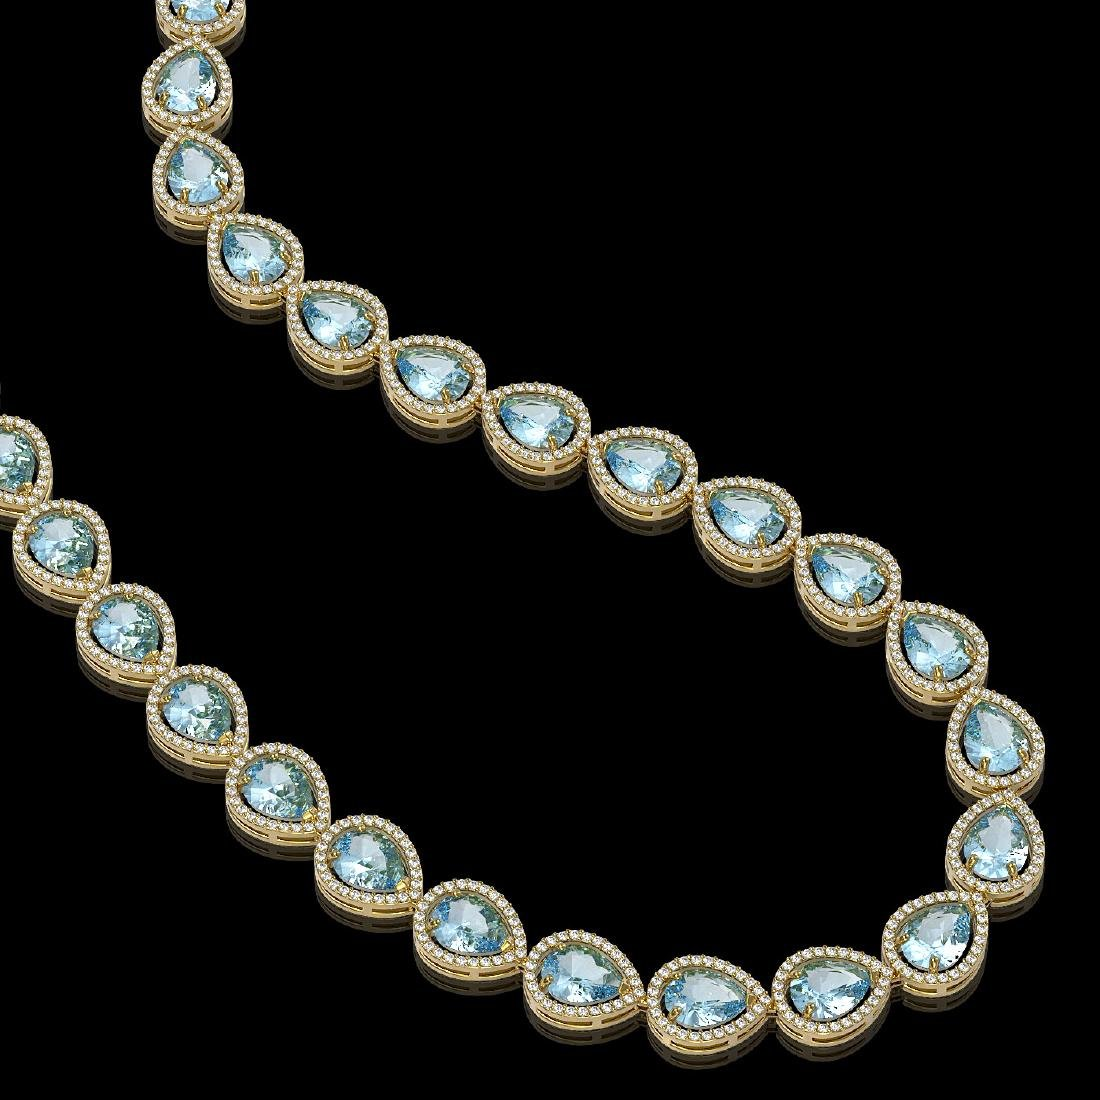 41.6 CTW Aquamarine & Diamond Halo Necklace 10K Yellow - 2